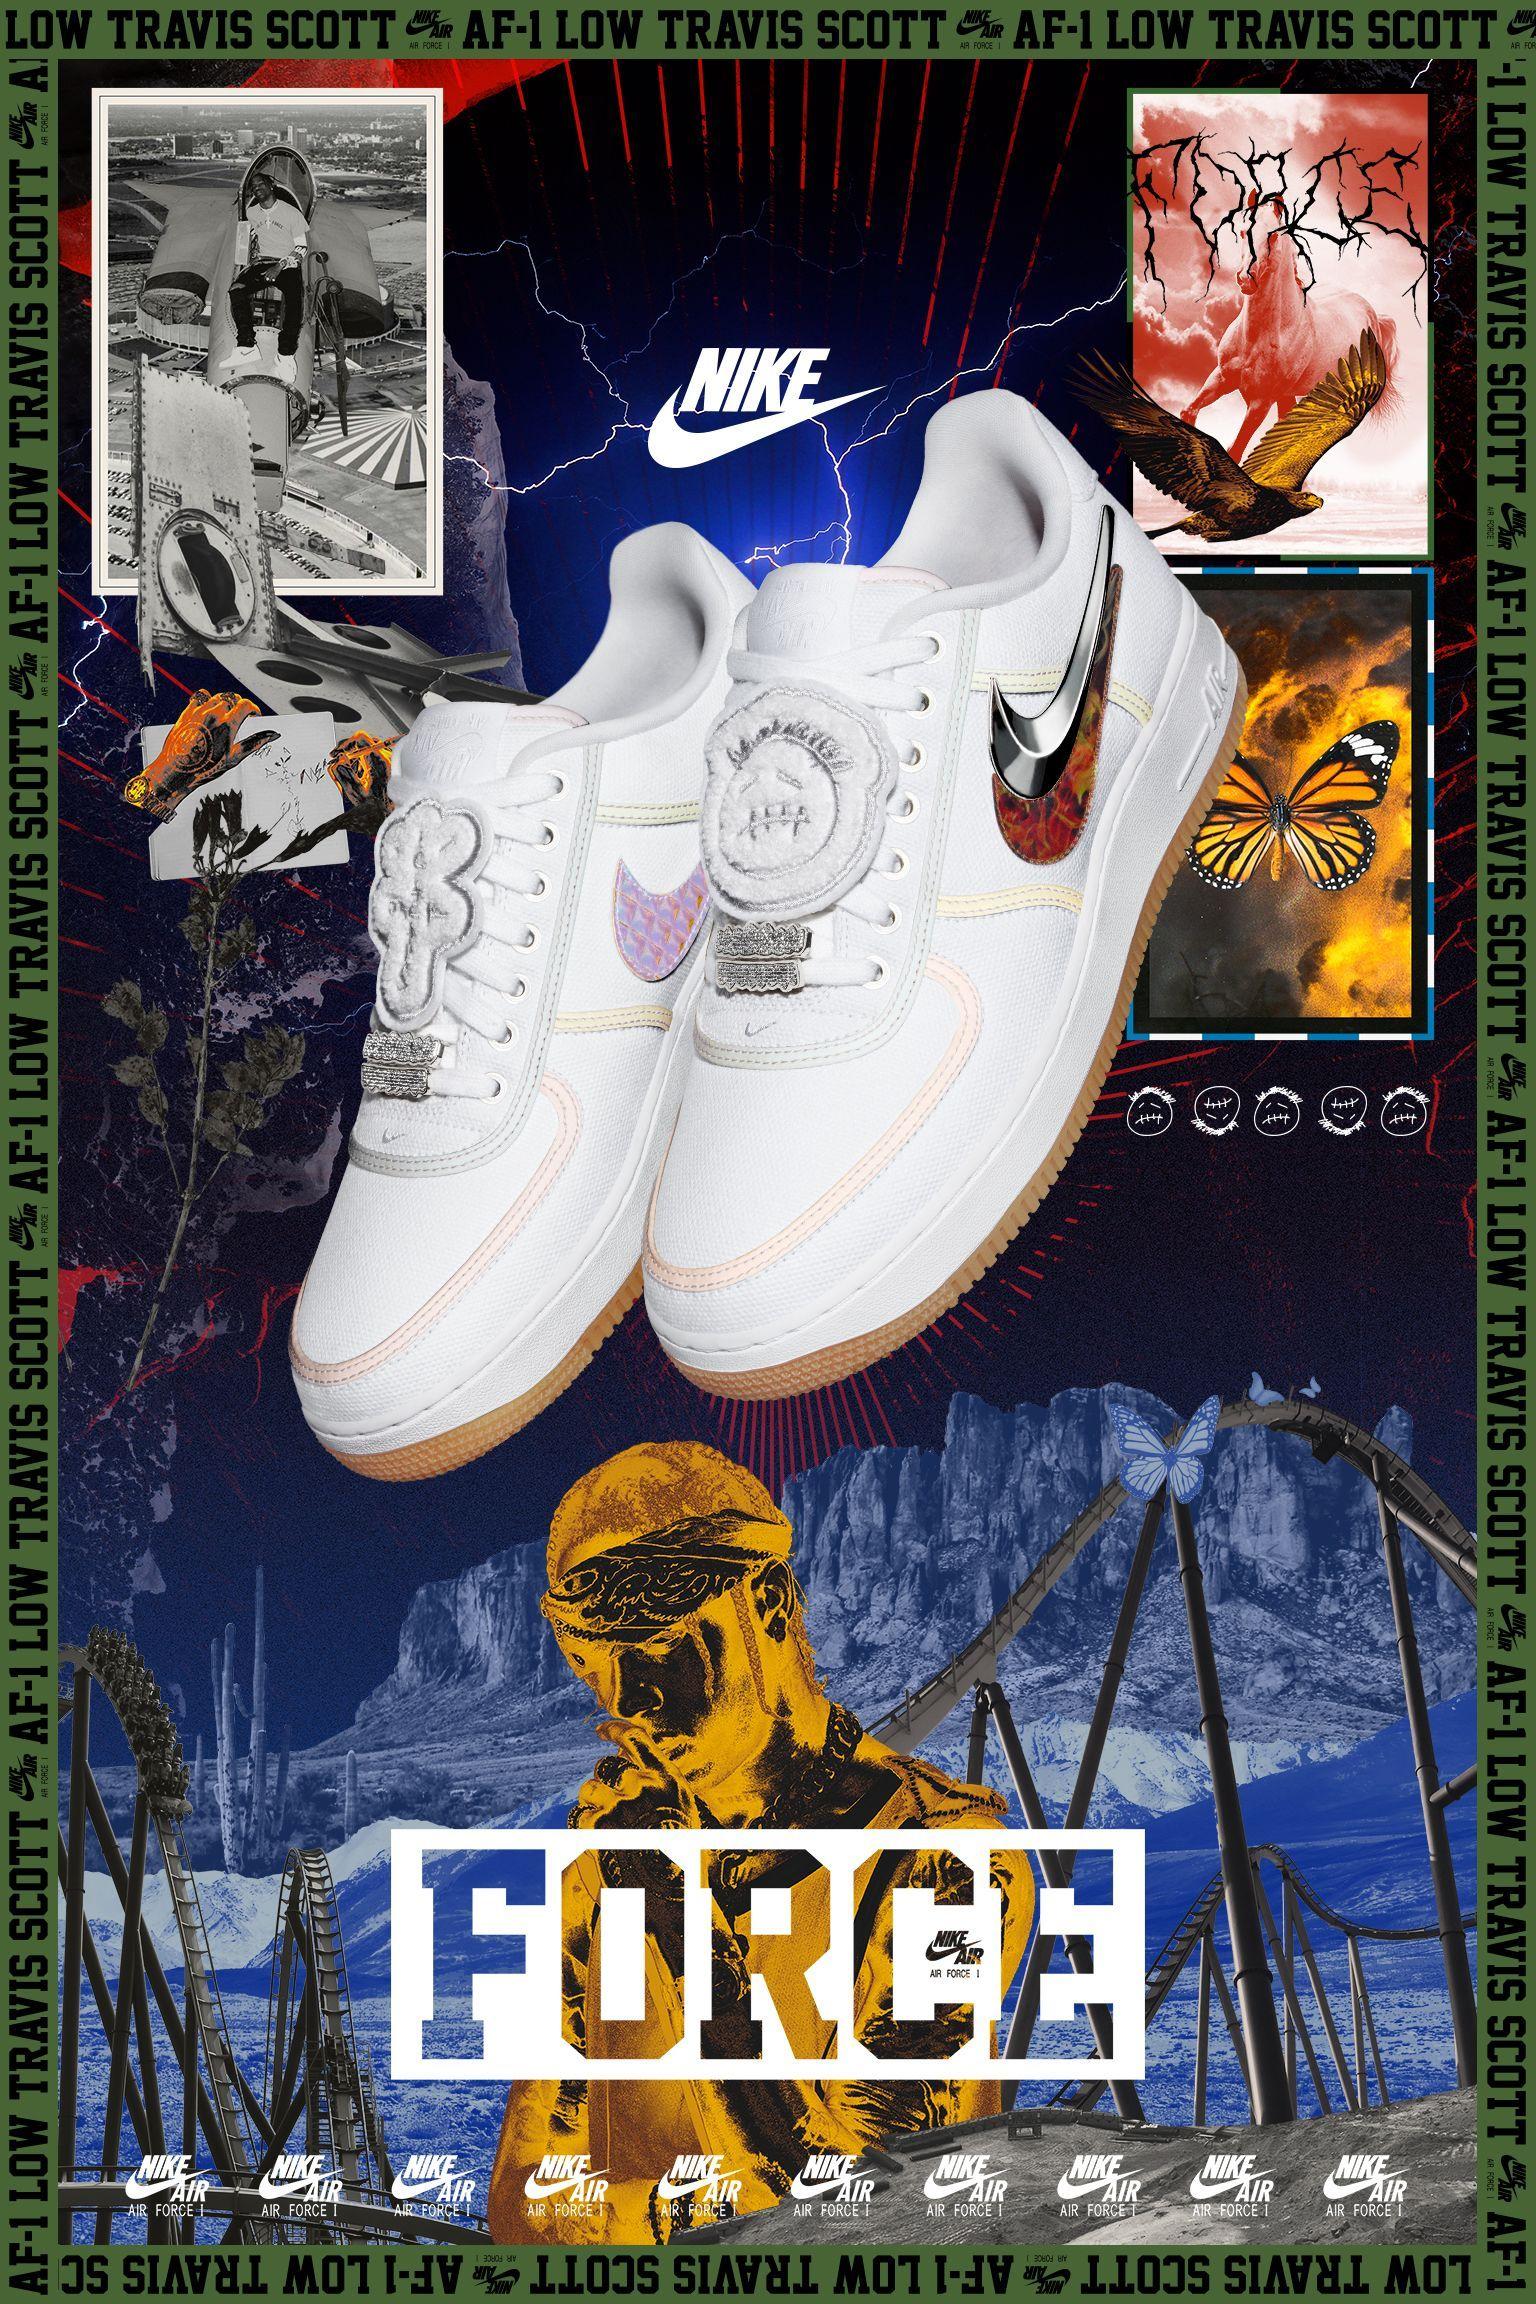 Nike Air Force 1 Travis Scott Release Date Sneaker Posters Sneakers Wallpaper Air Force 1 Travis Scott